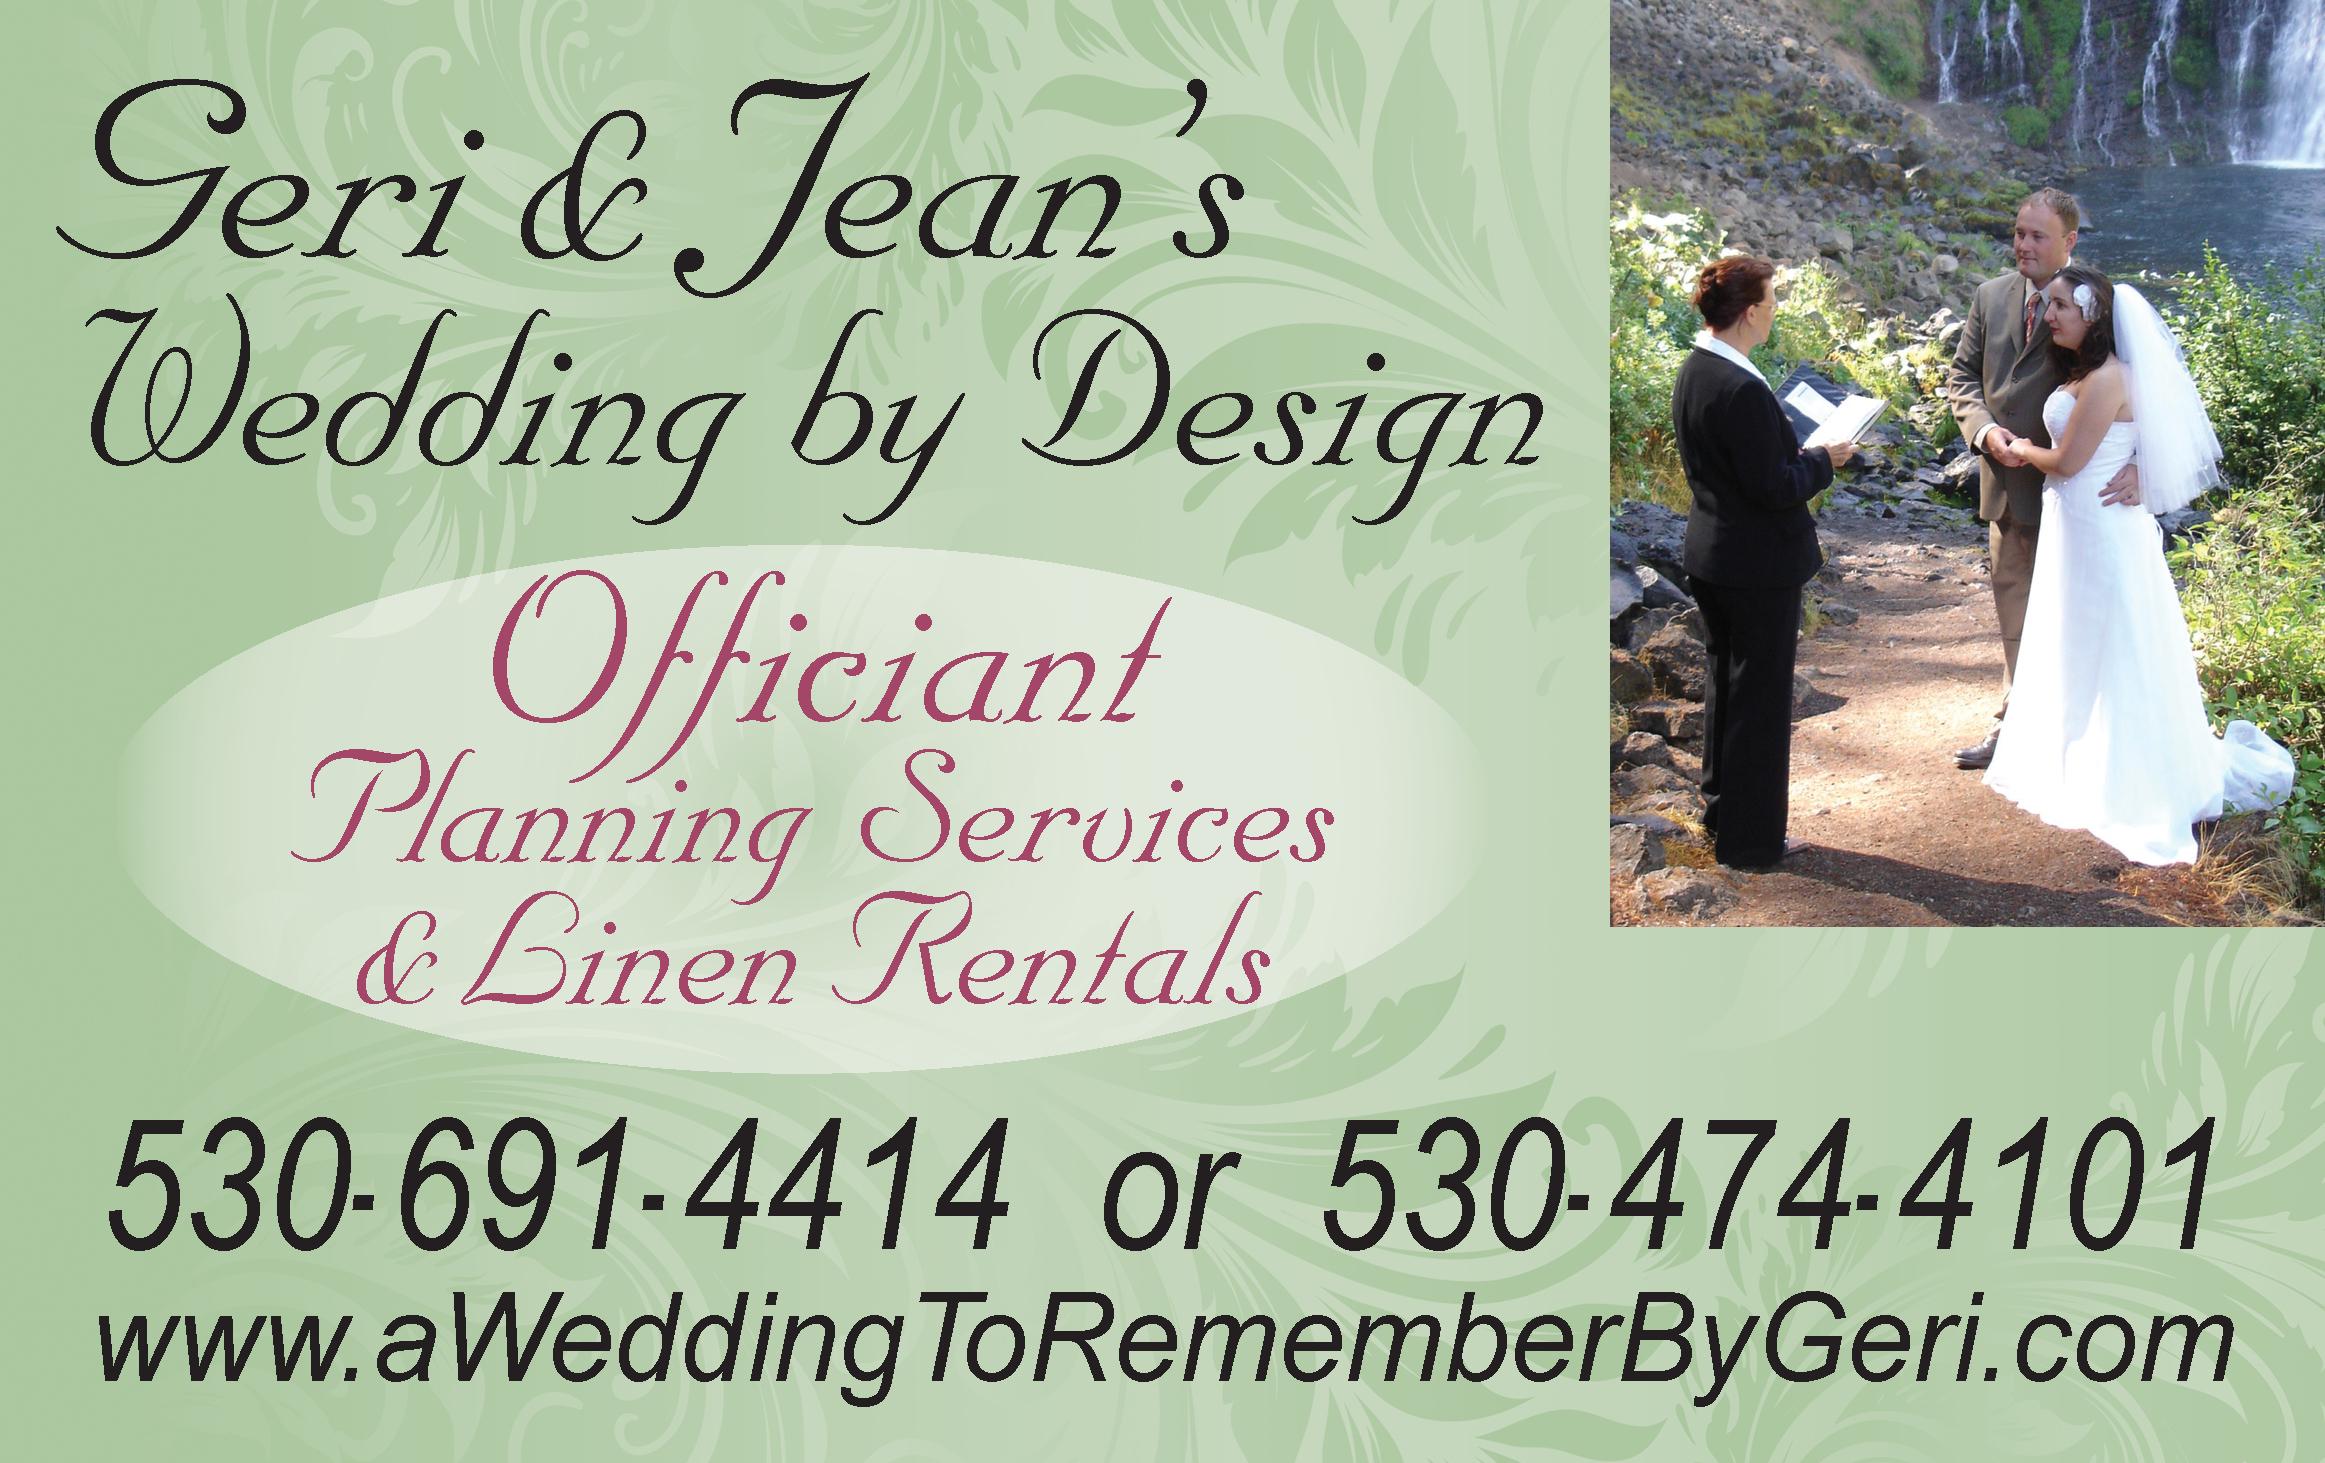 Redding Wedding Geri & Jean Officiant